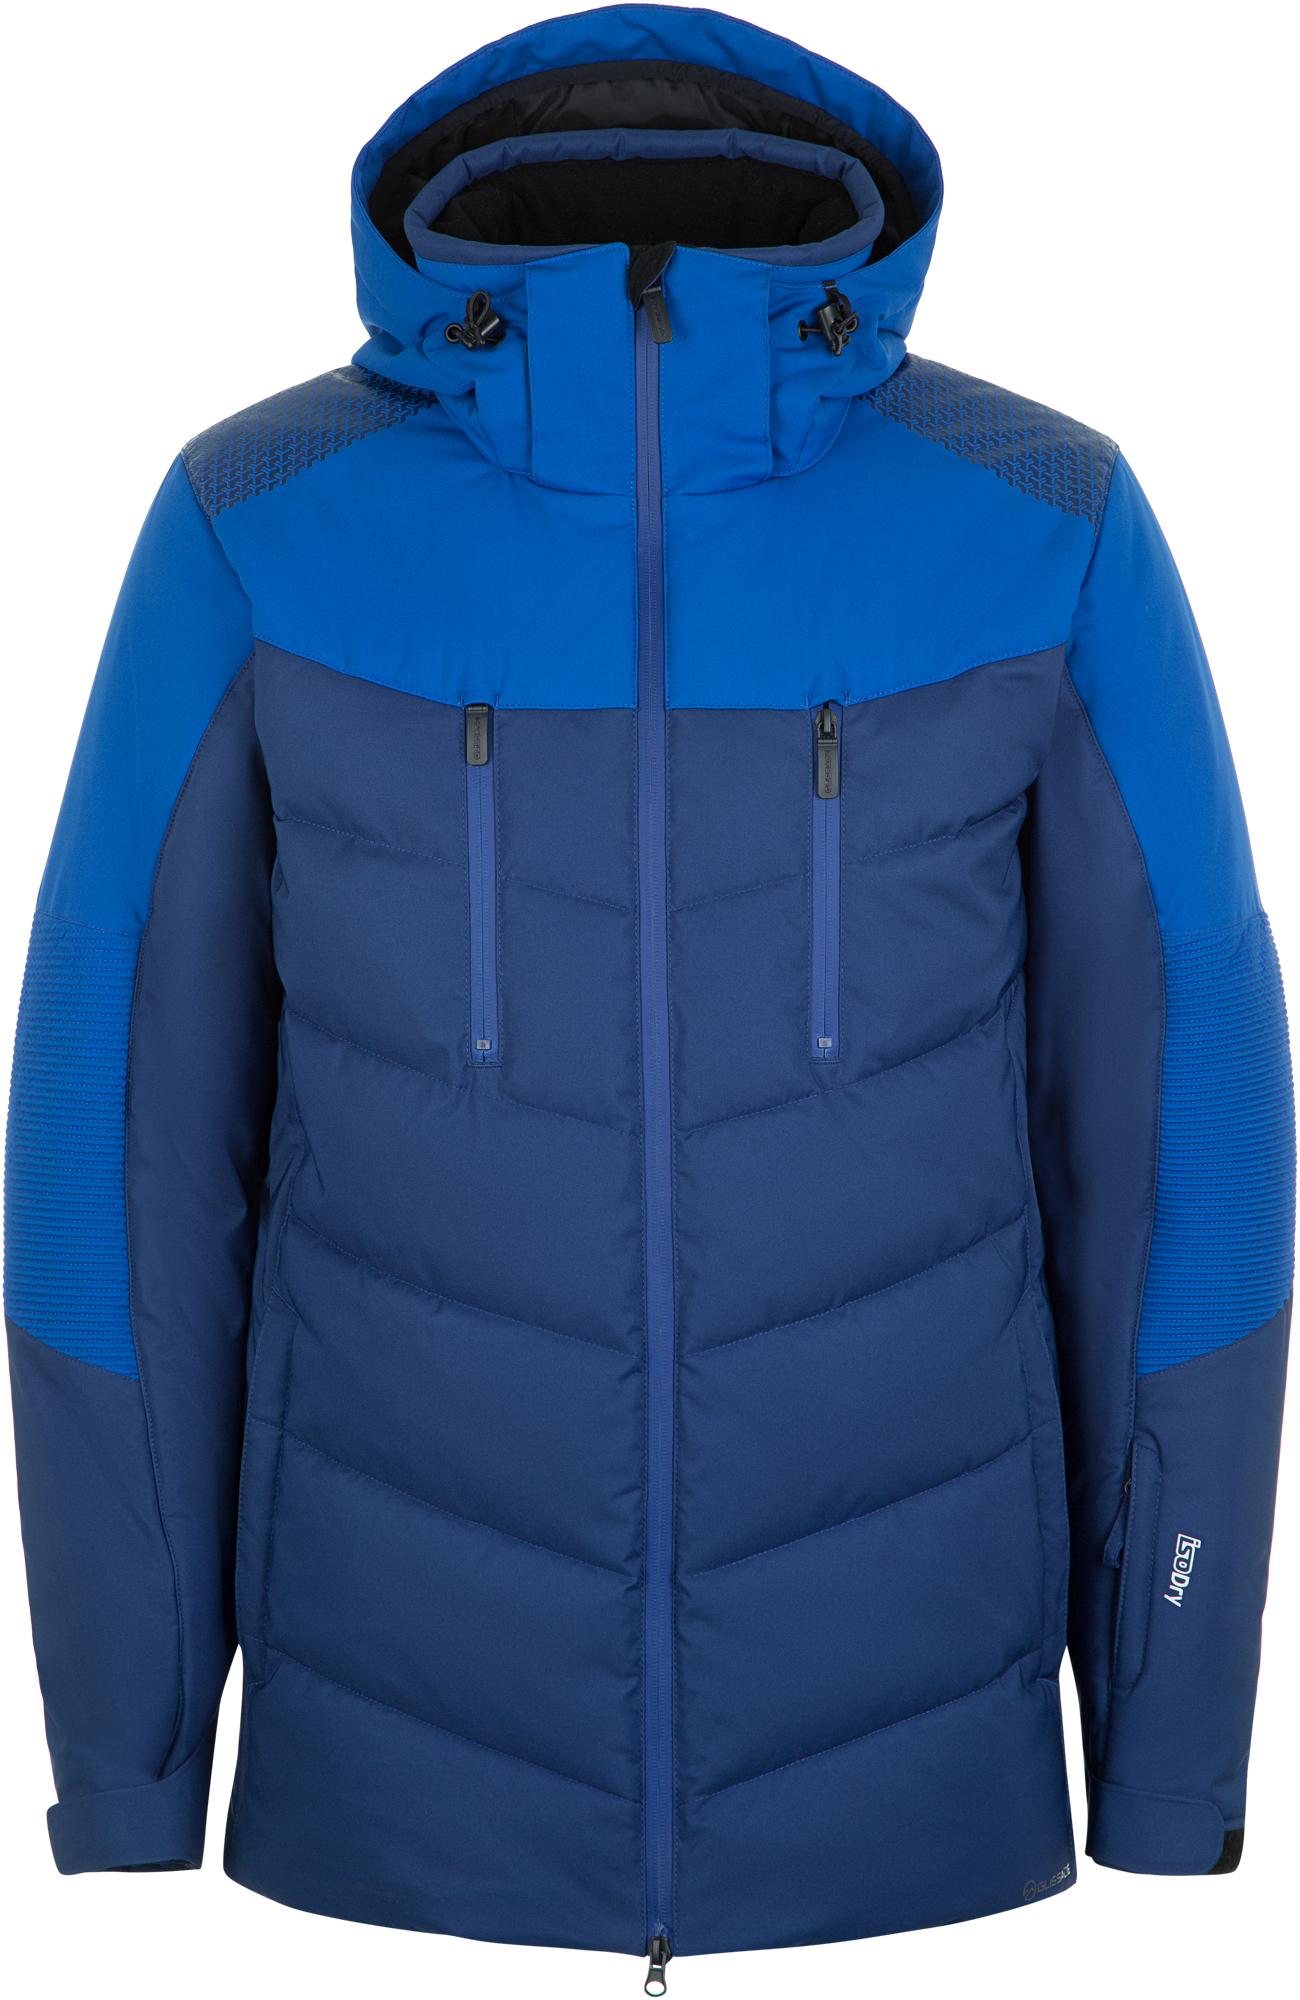 Glissade Куртка утепленная мужская Glissade, размер 56 цена и фото